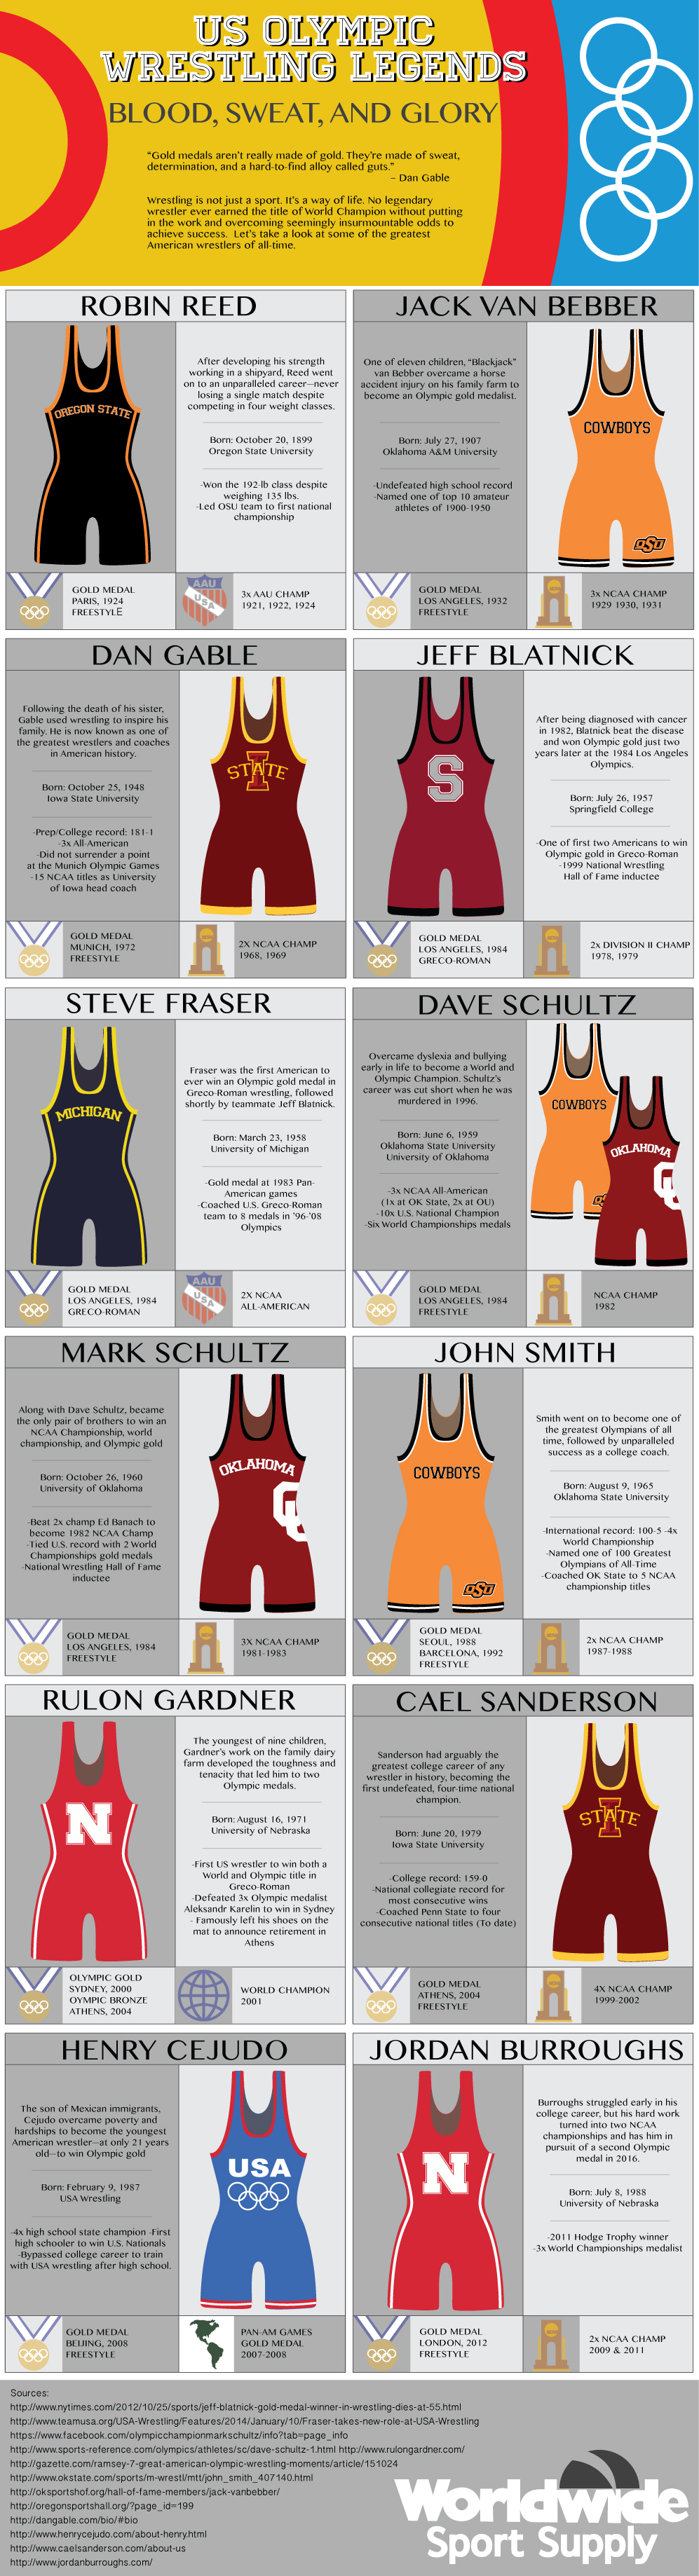 US-Olympic Wrestling-Legends